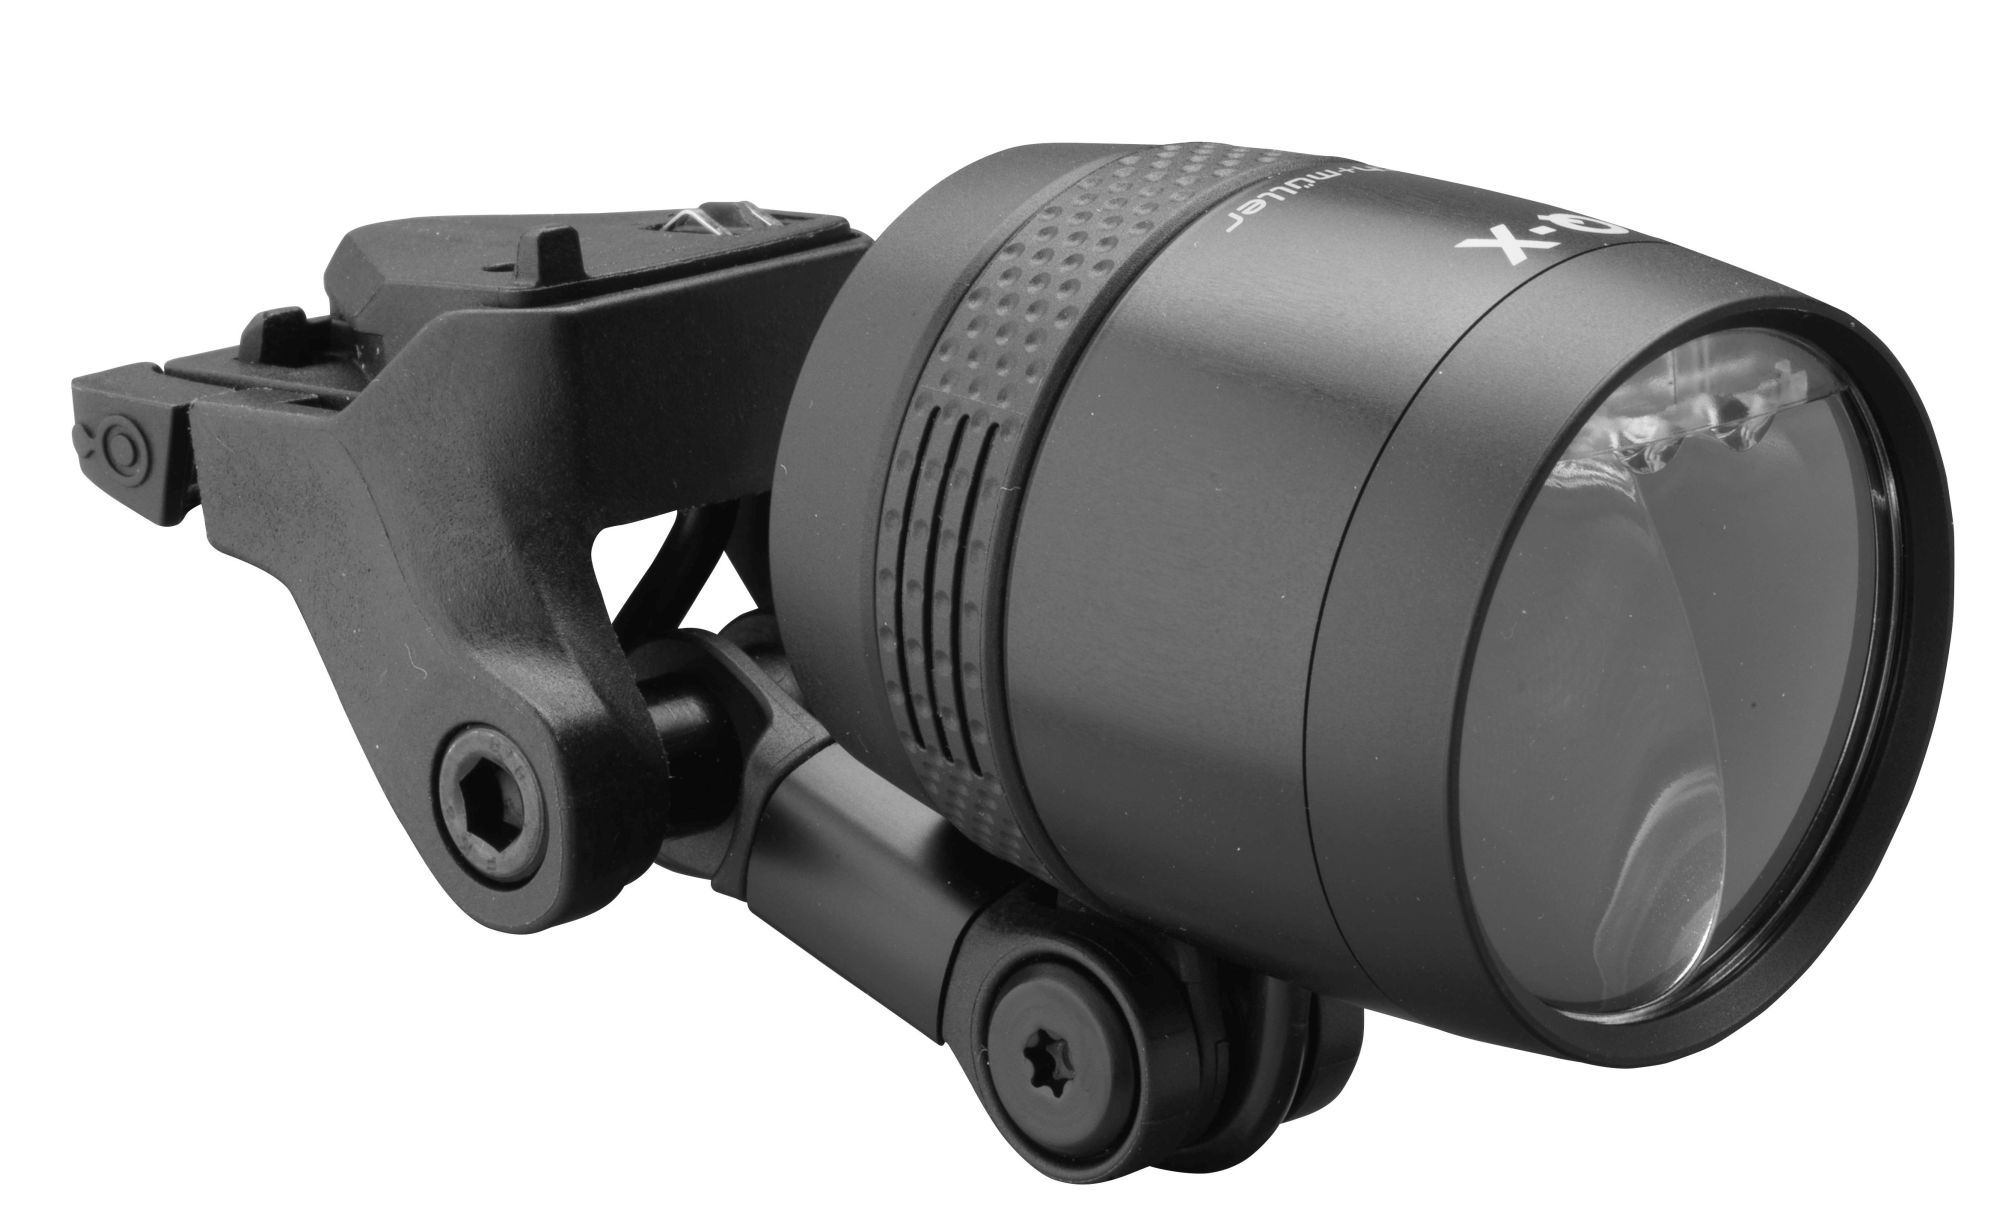 Busch & Müller E-Bike Scheinwerfer Lumotec IQ-X ML